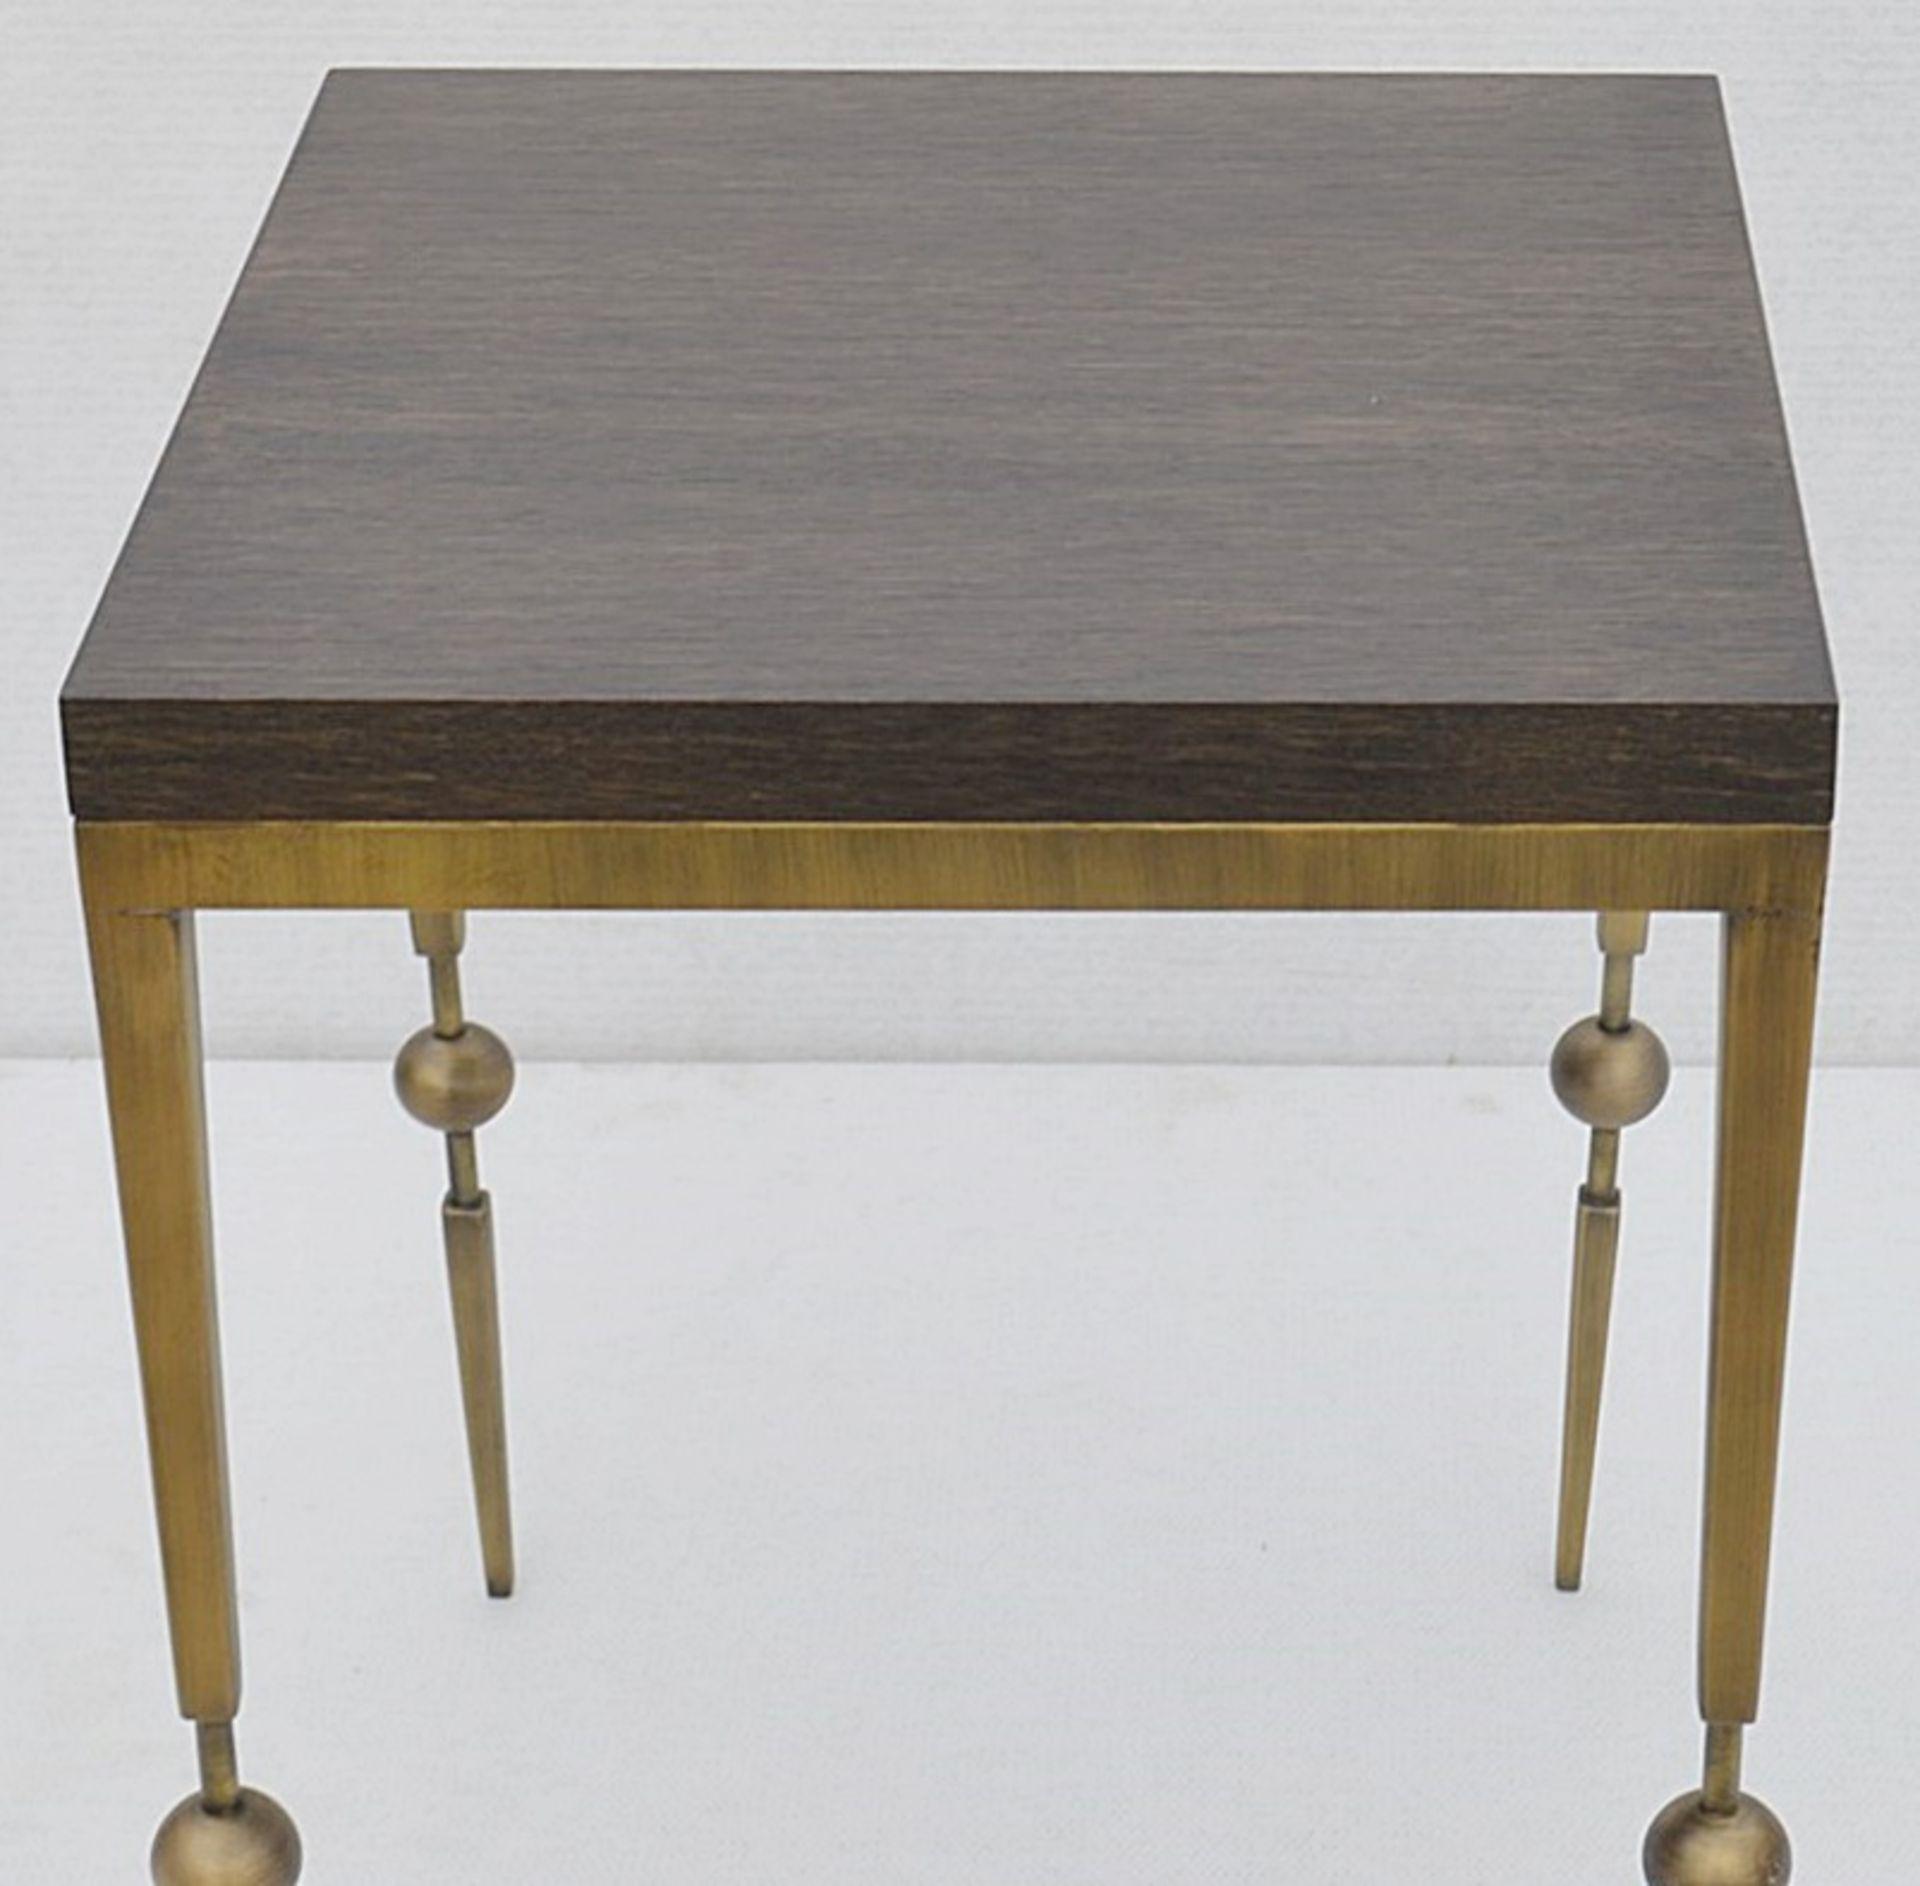 1 x JUSTIN VAN BREDA 'Sphere' Designer Occasional Table - Dimensions: H70 x W52 x D52cm - Ref: - Image 6 of 7